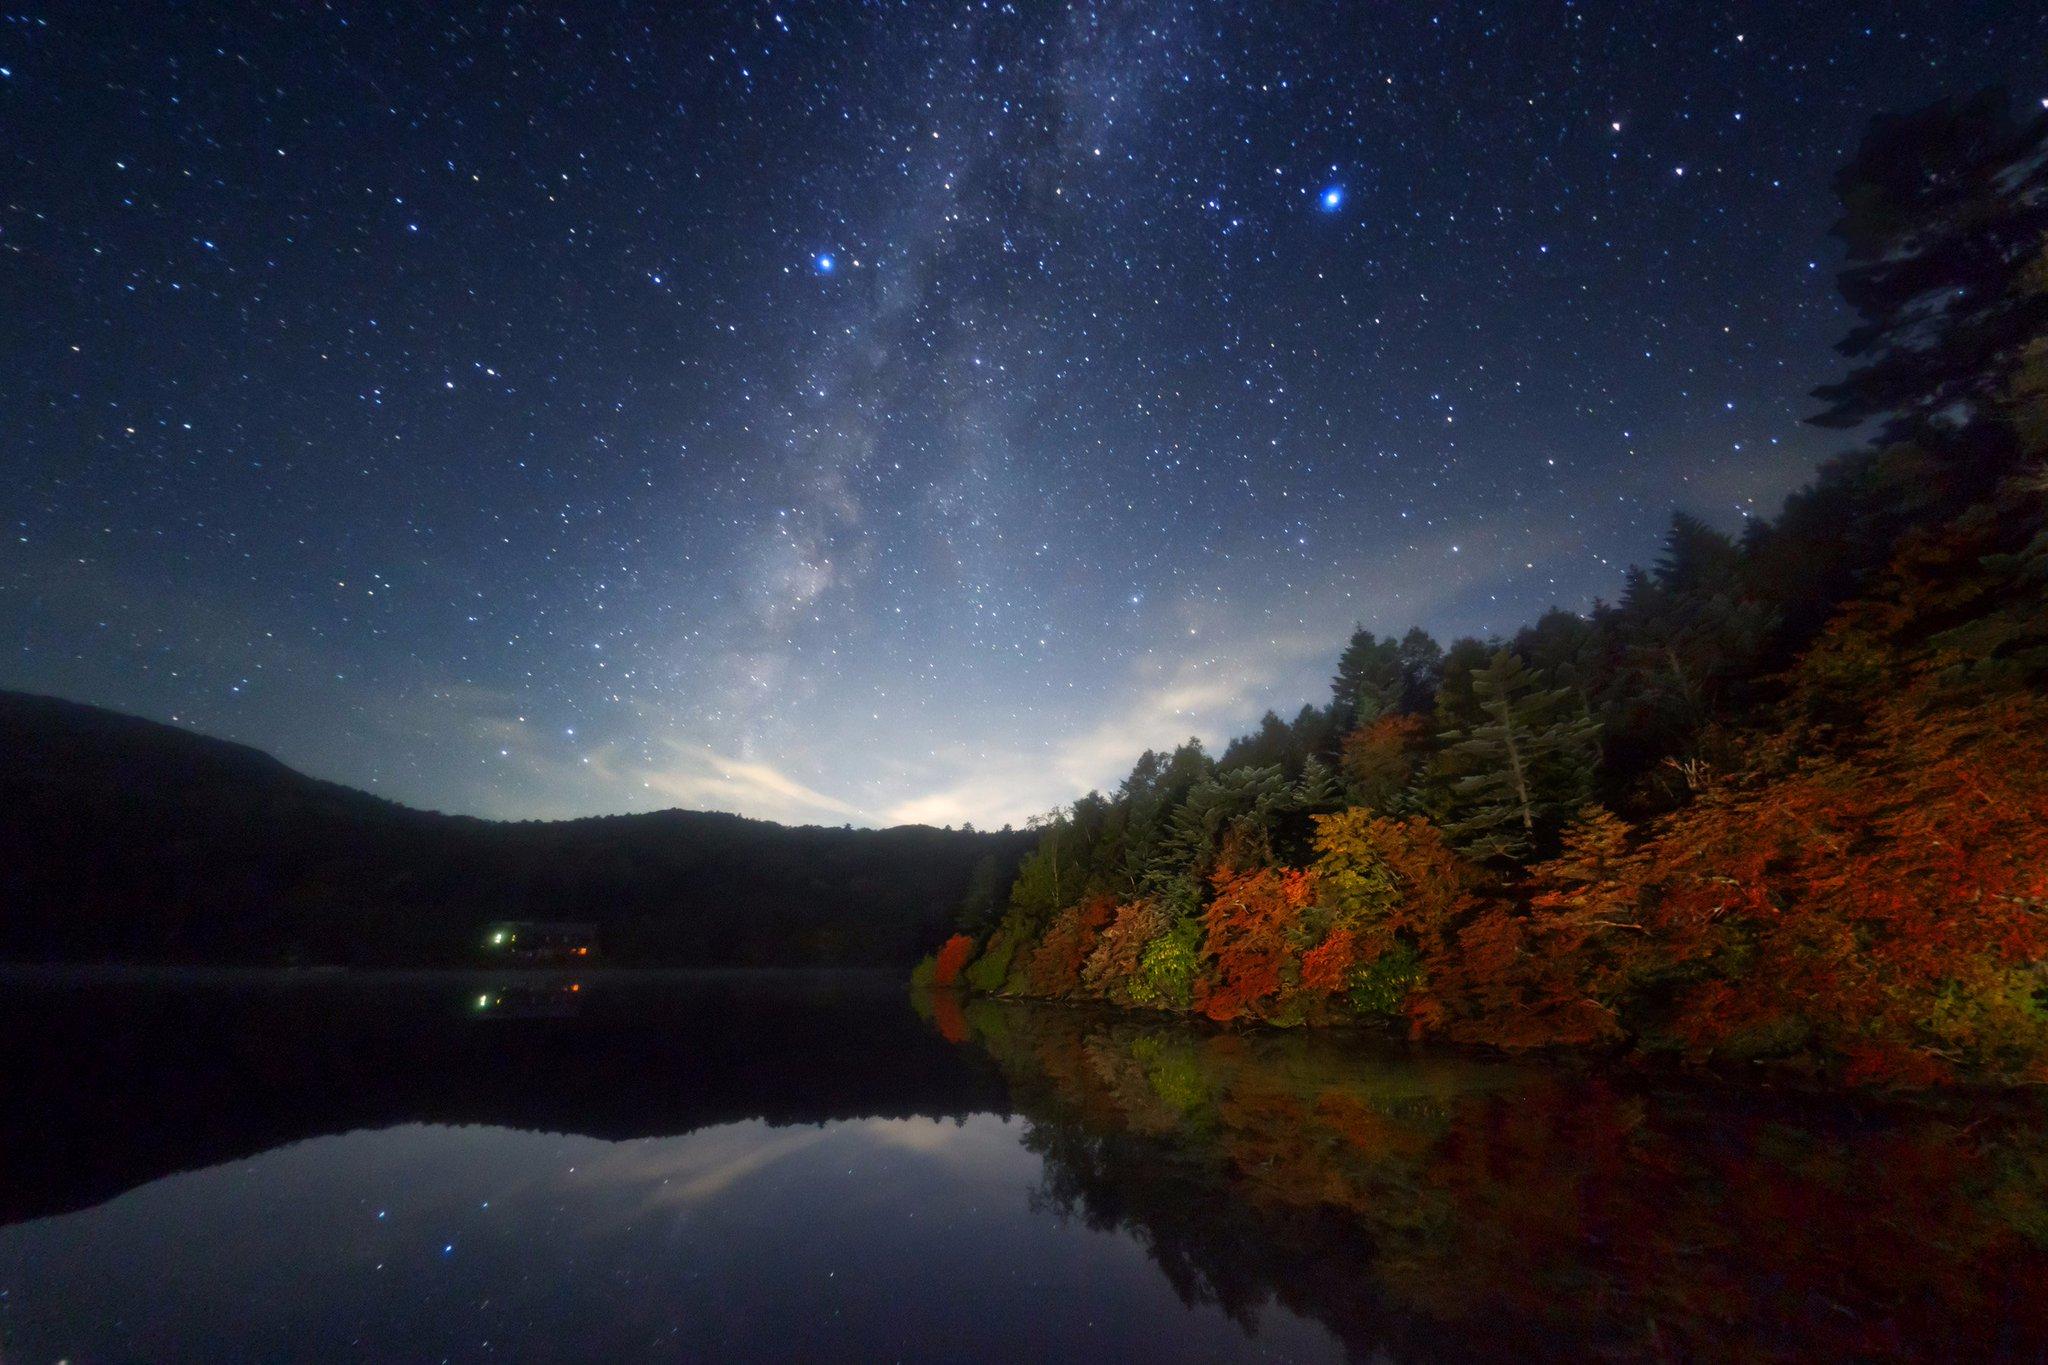 Про андрюху, картинки со звездным небом осень